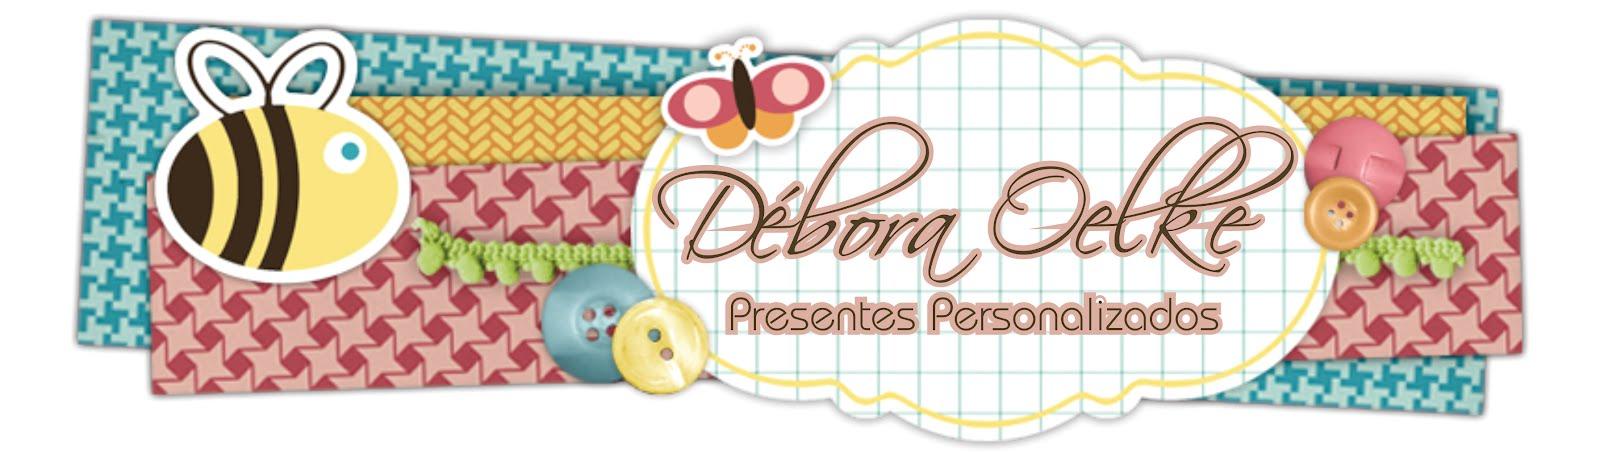 Débora Oelke Presentes Personalizados